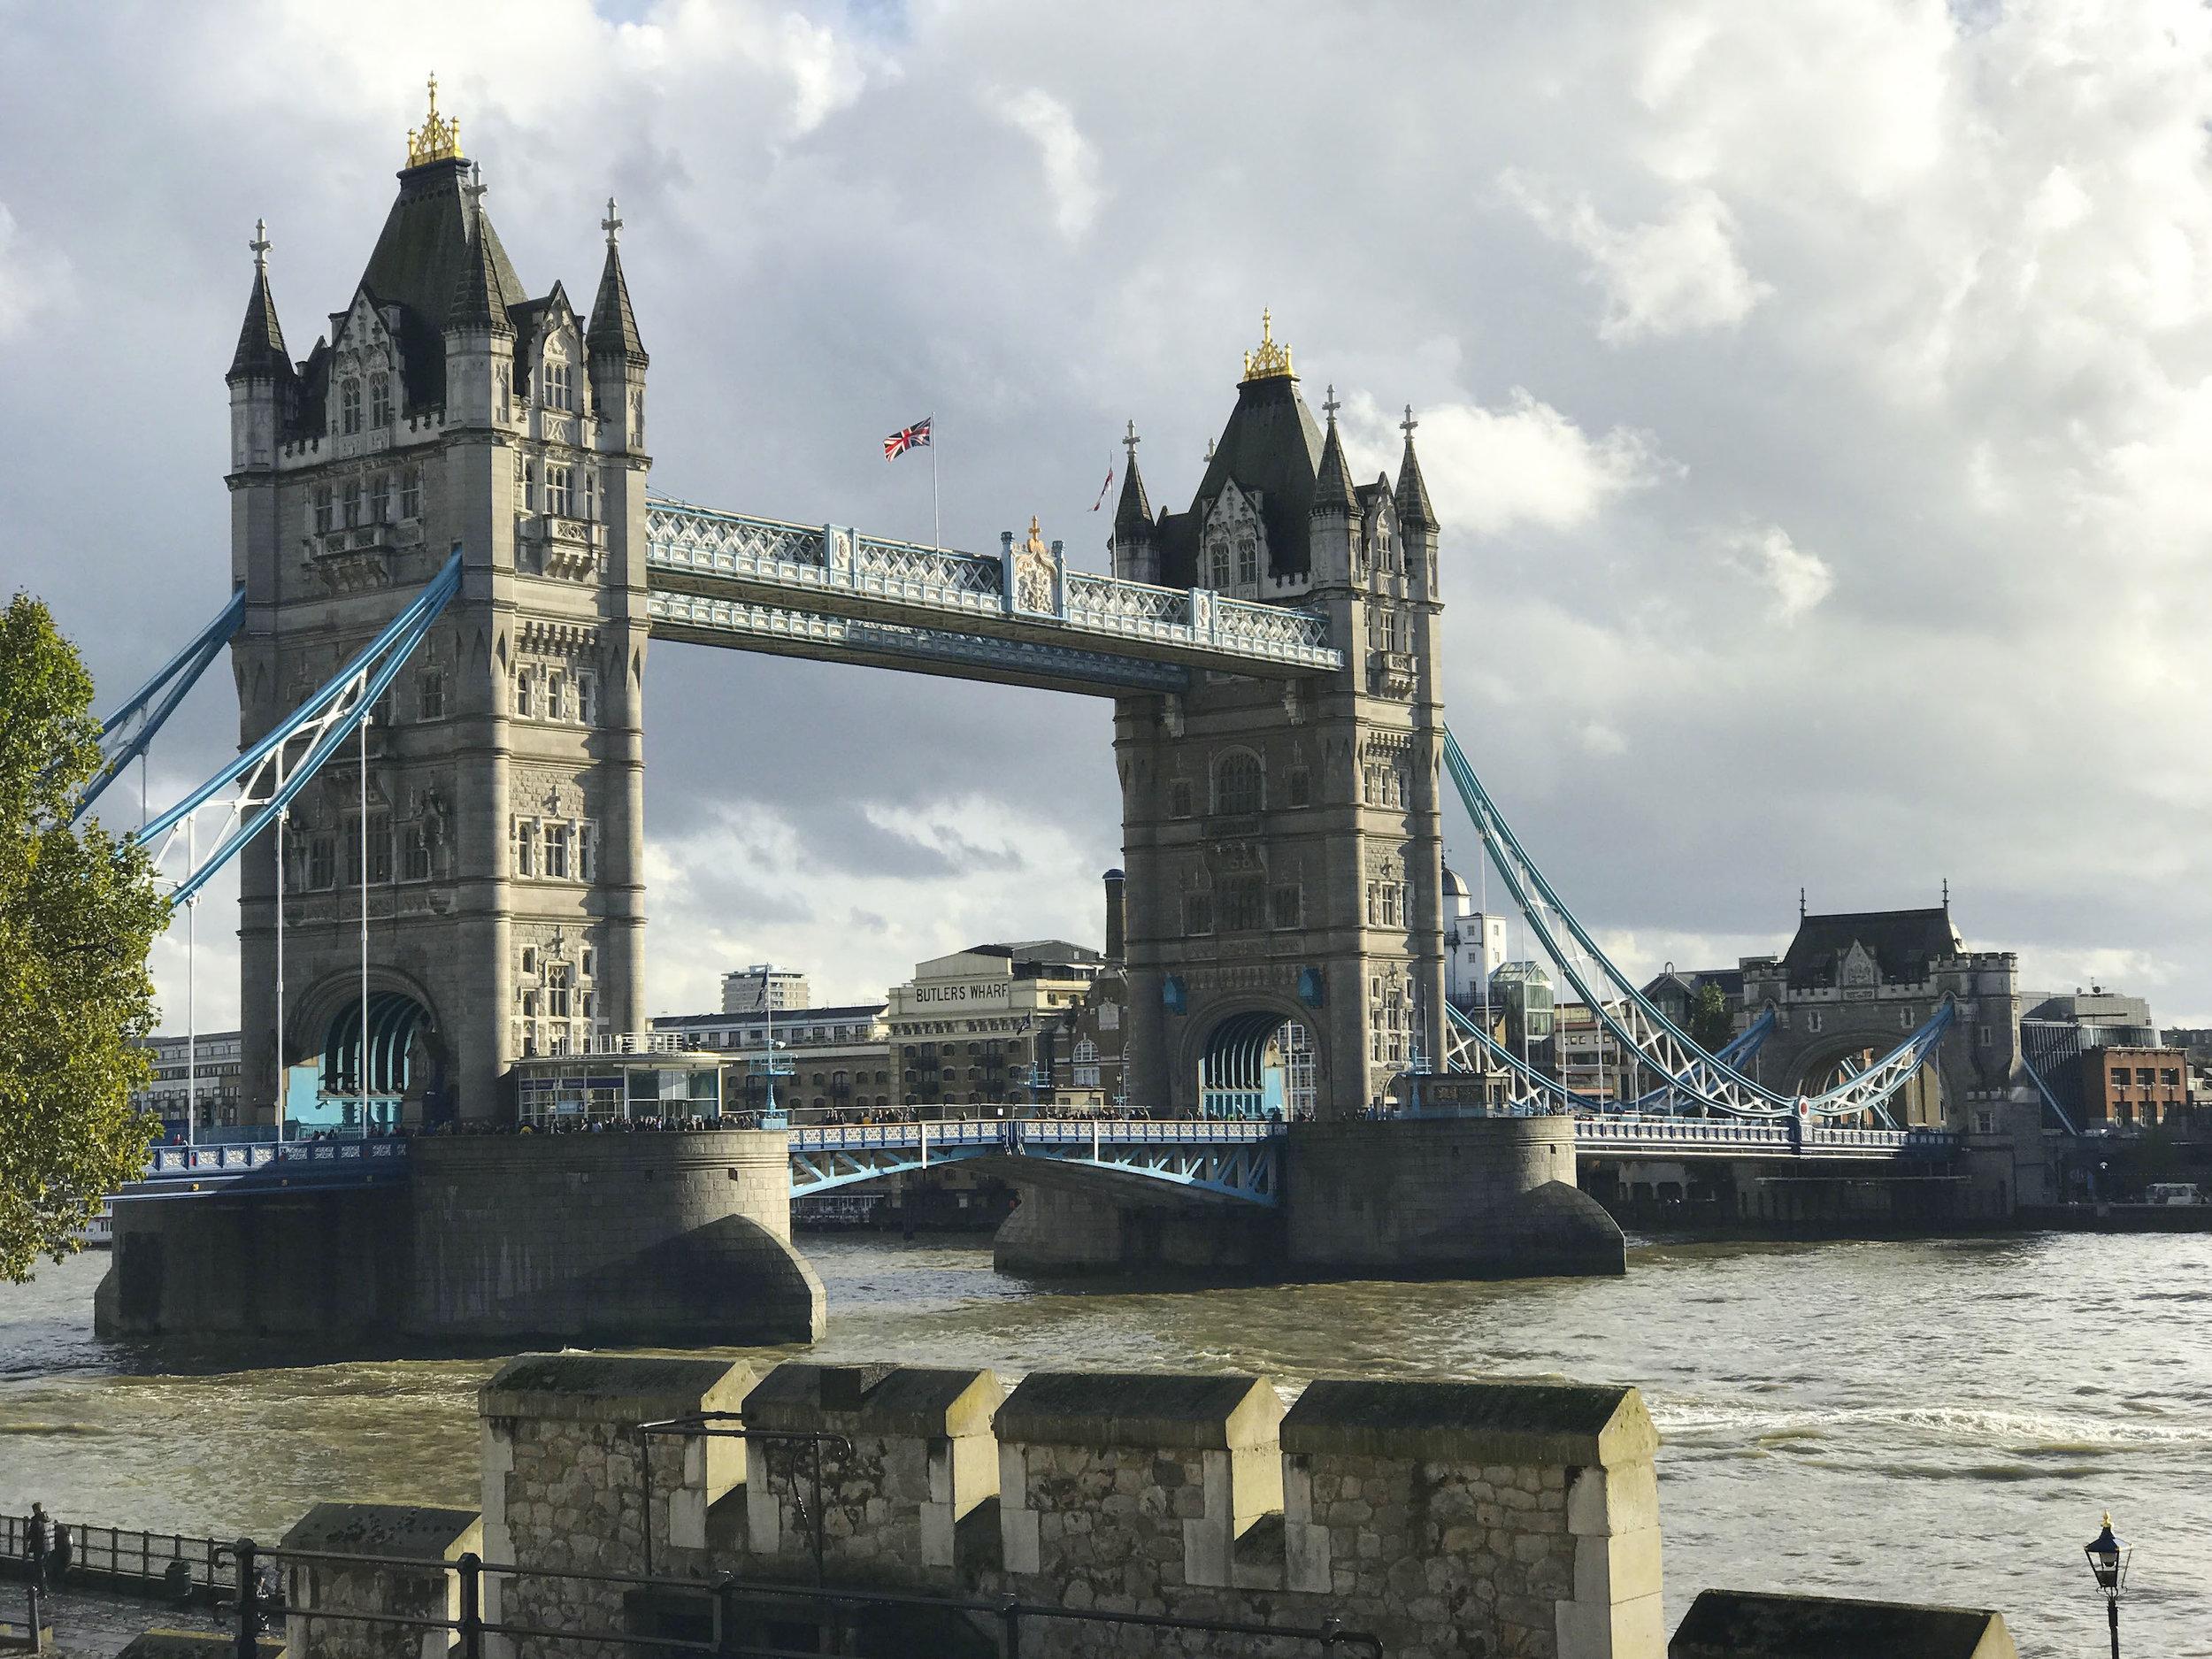 Tower Bridge | London Travel Guide Part 3 | BySarahRae.com